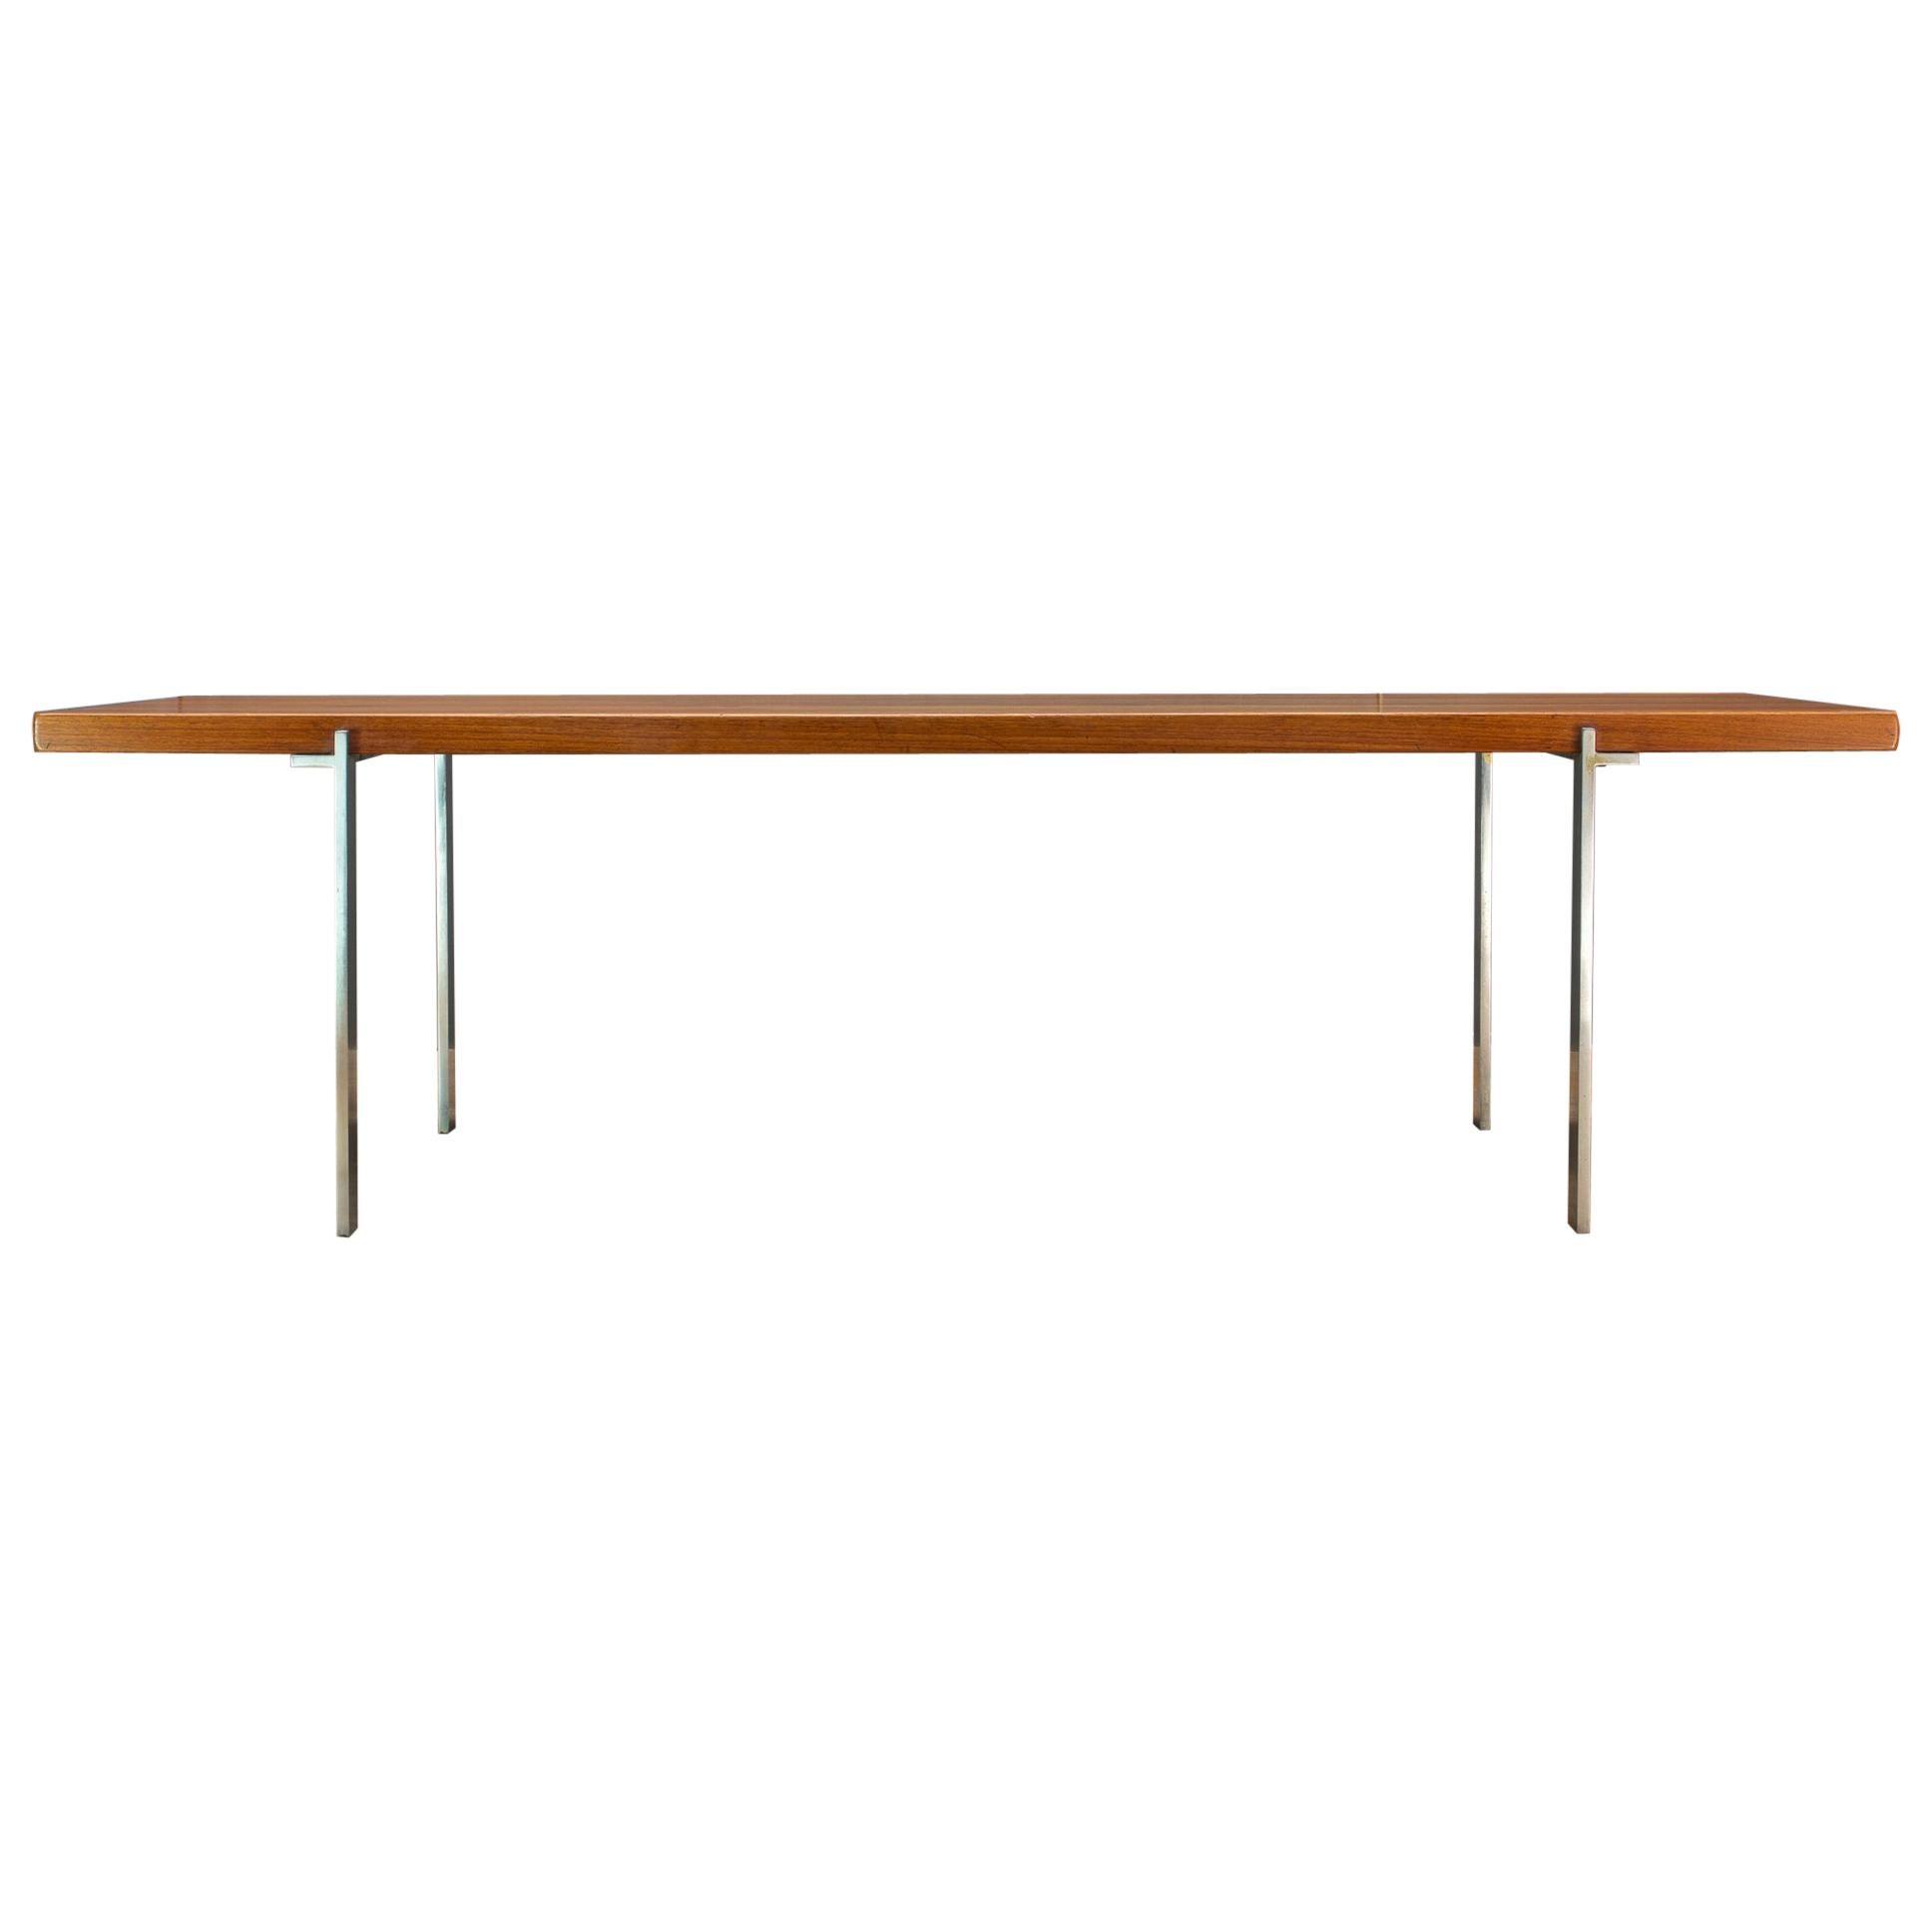 1960s American Studio Craft Coffee Table Solid Teak Plank Welded Steel Baltimore